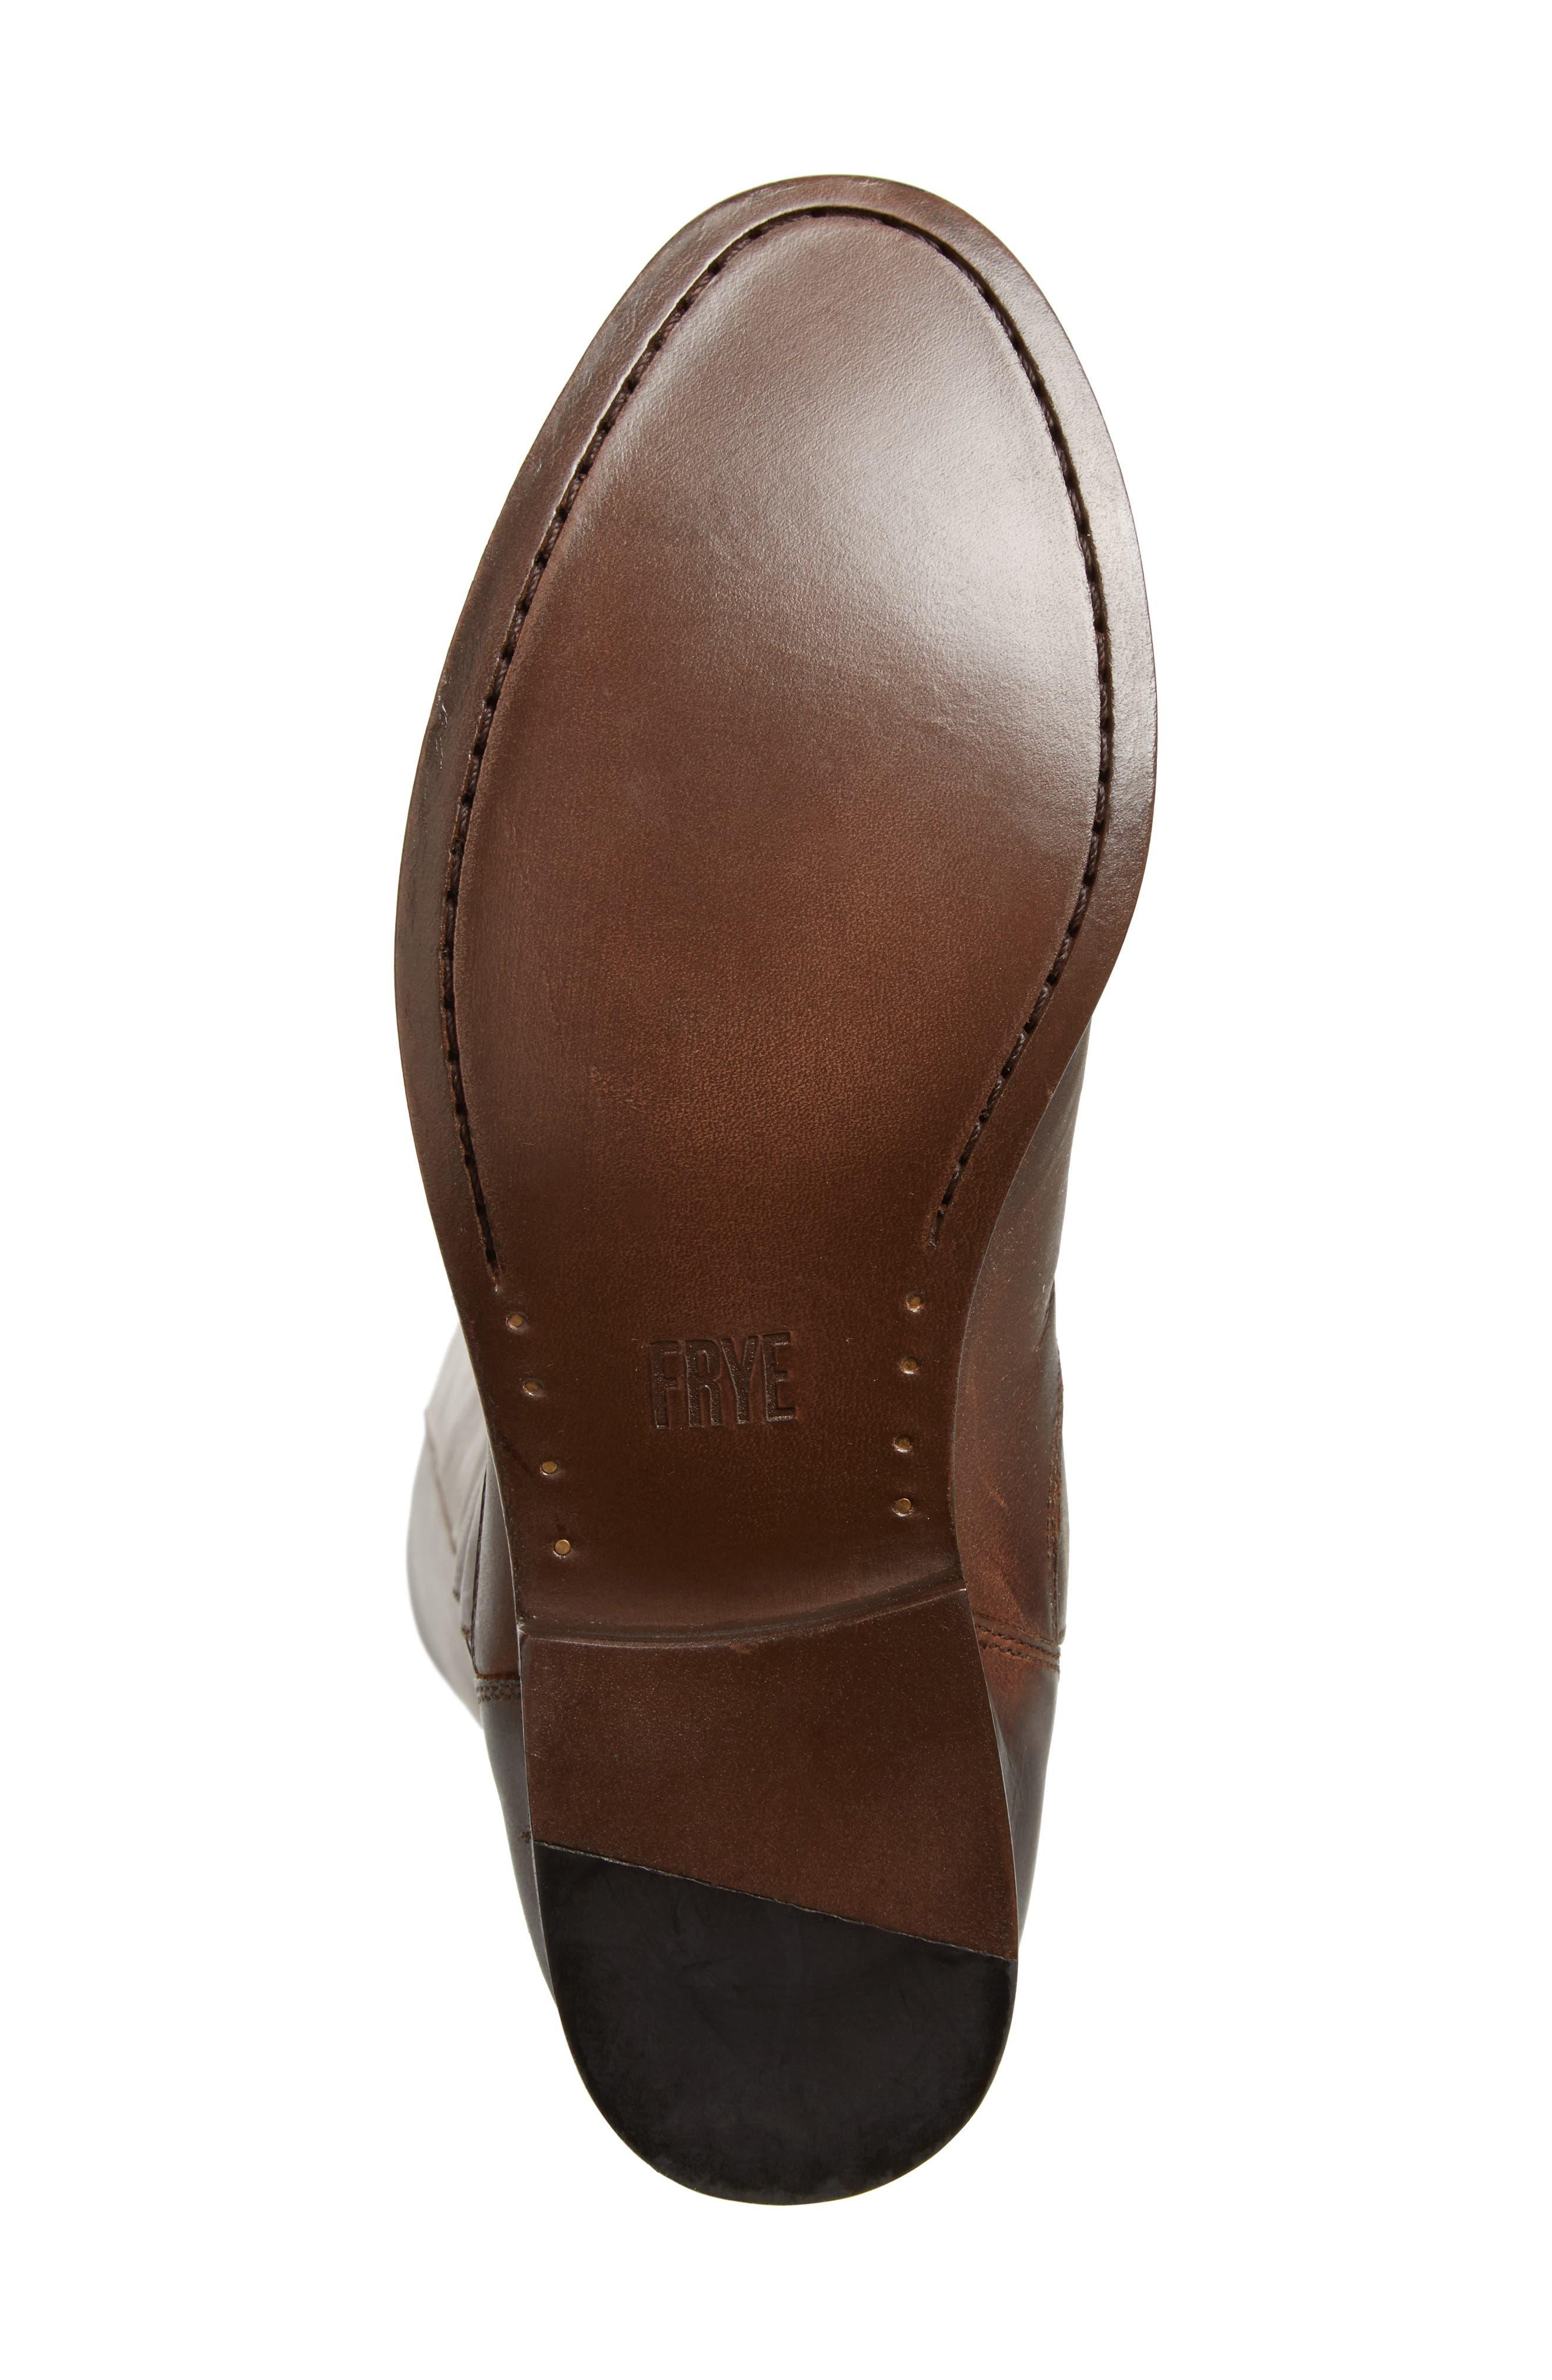 Melissa Stud Knee High Boot,                             Alternate thumbnail 6, color,                             Chocolate Leather